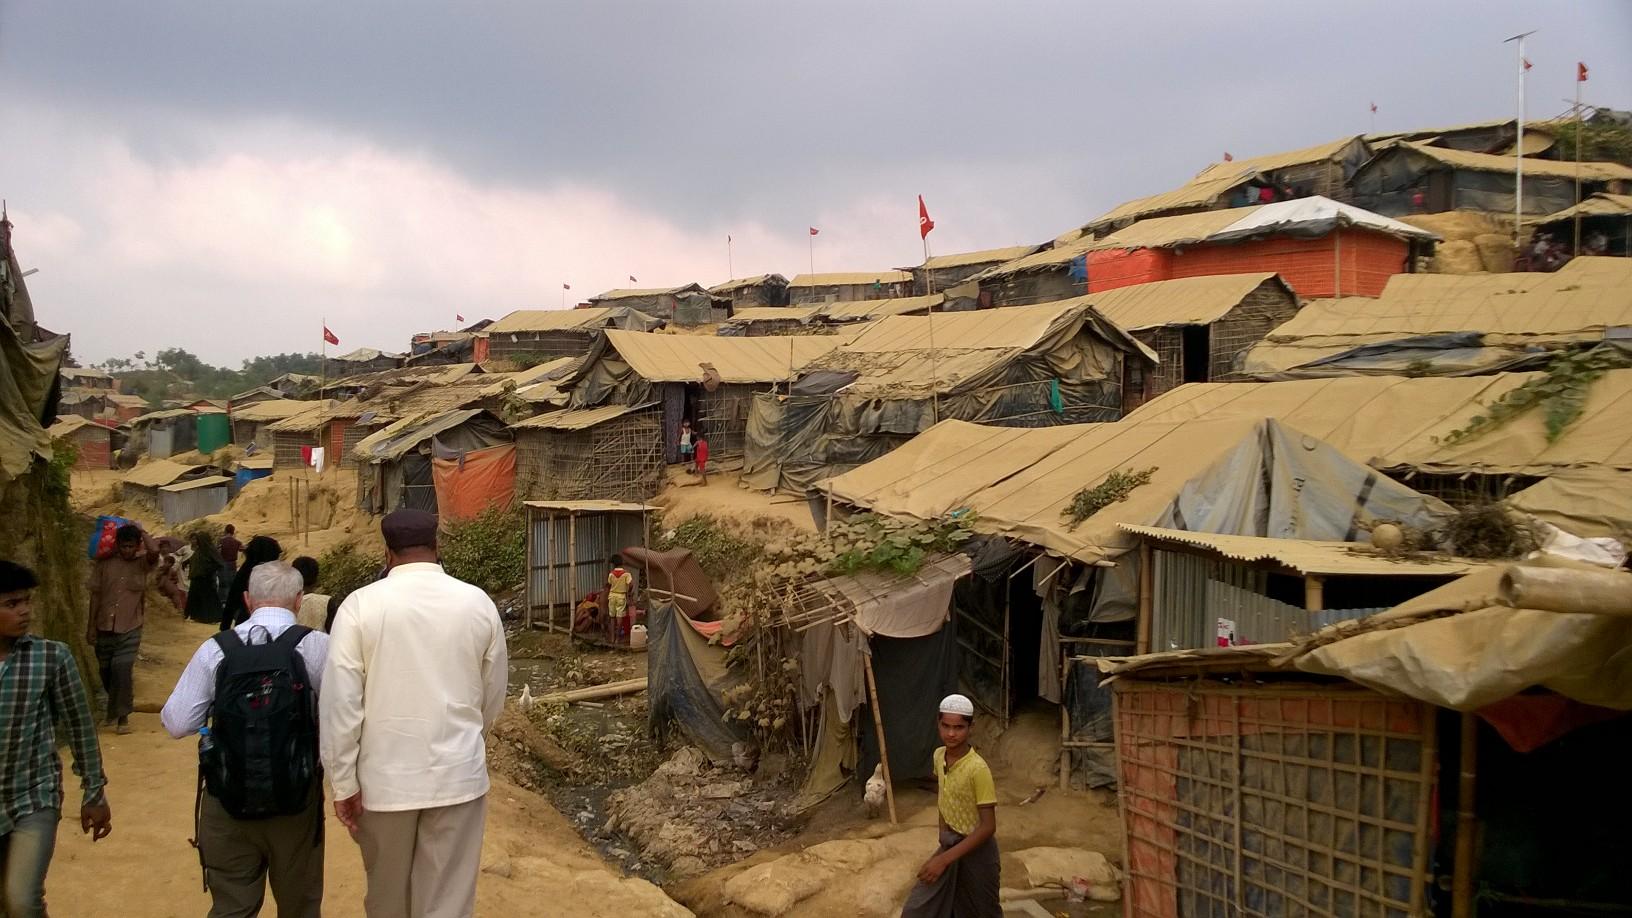 Rabbi David Saperstein visits a refugee camp in Bangladesh